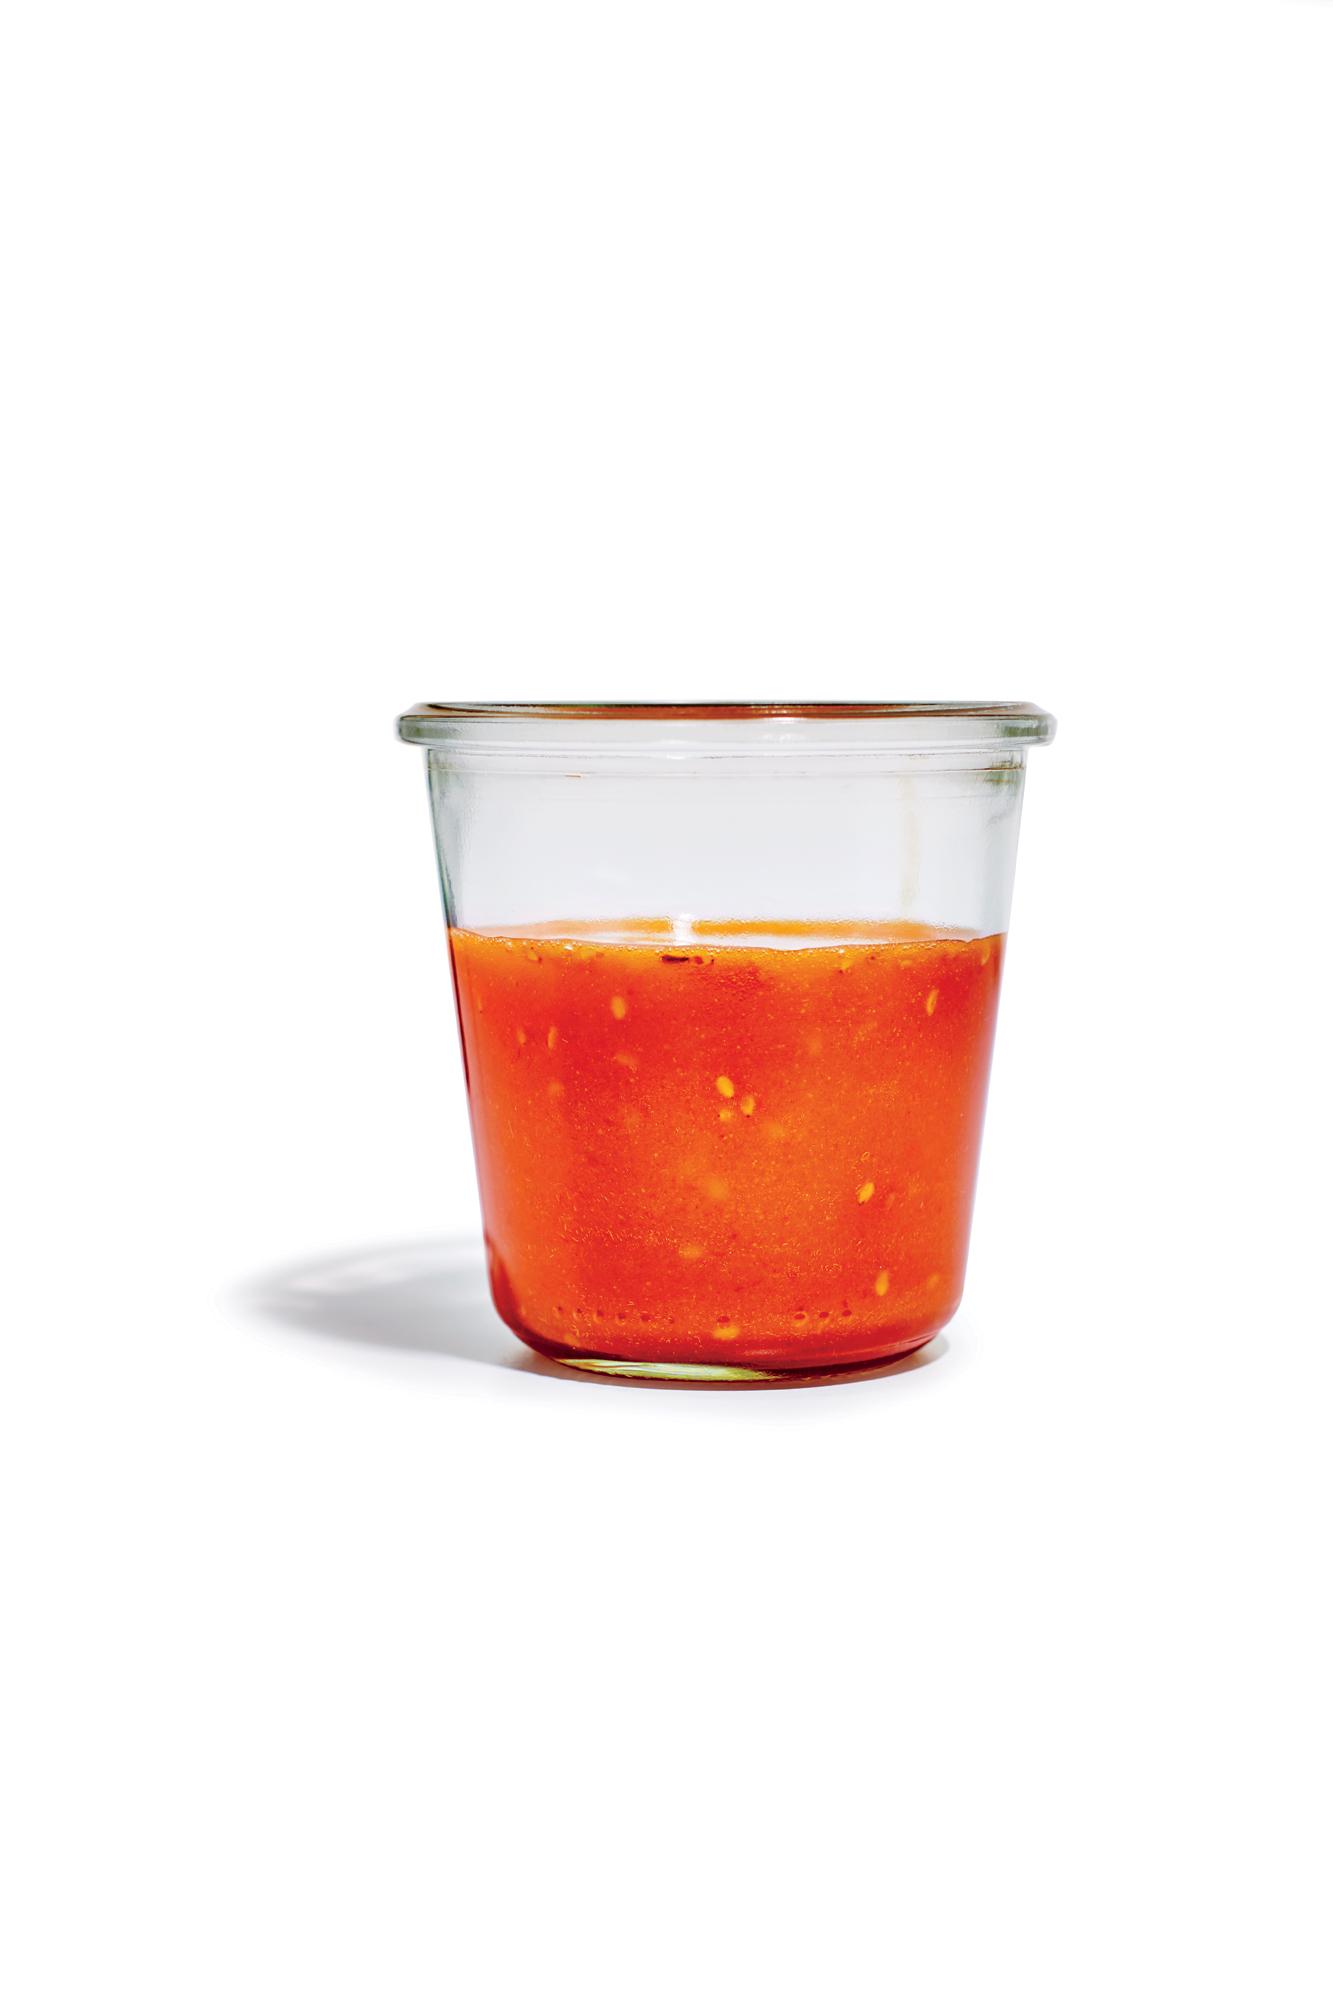 Spicy Soy Vinaigrette